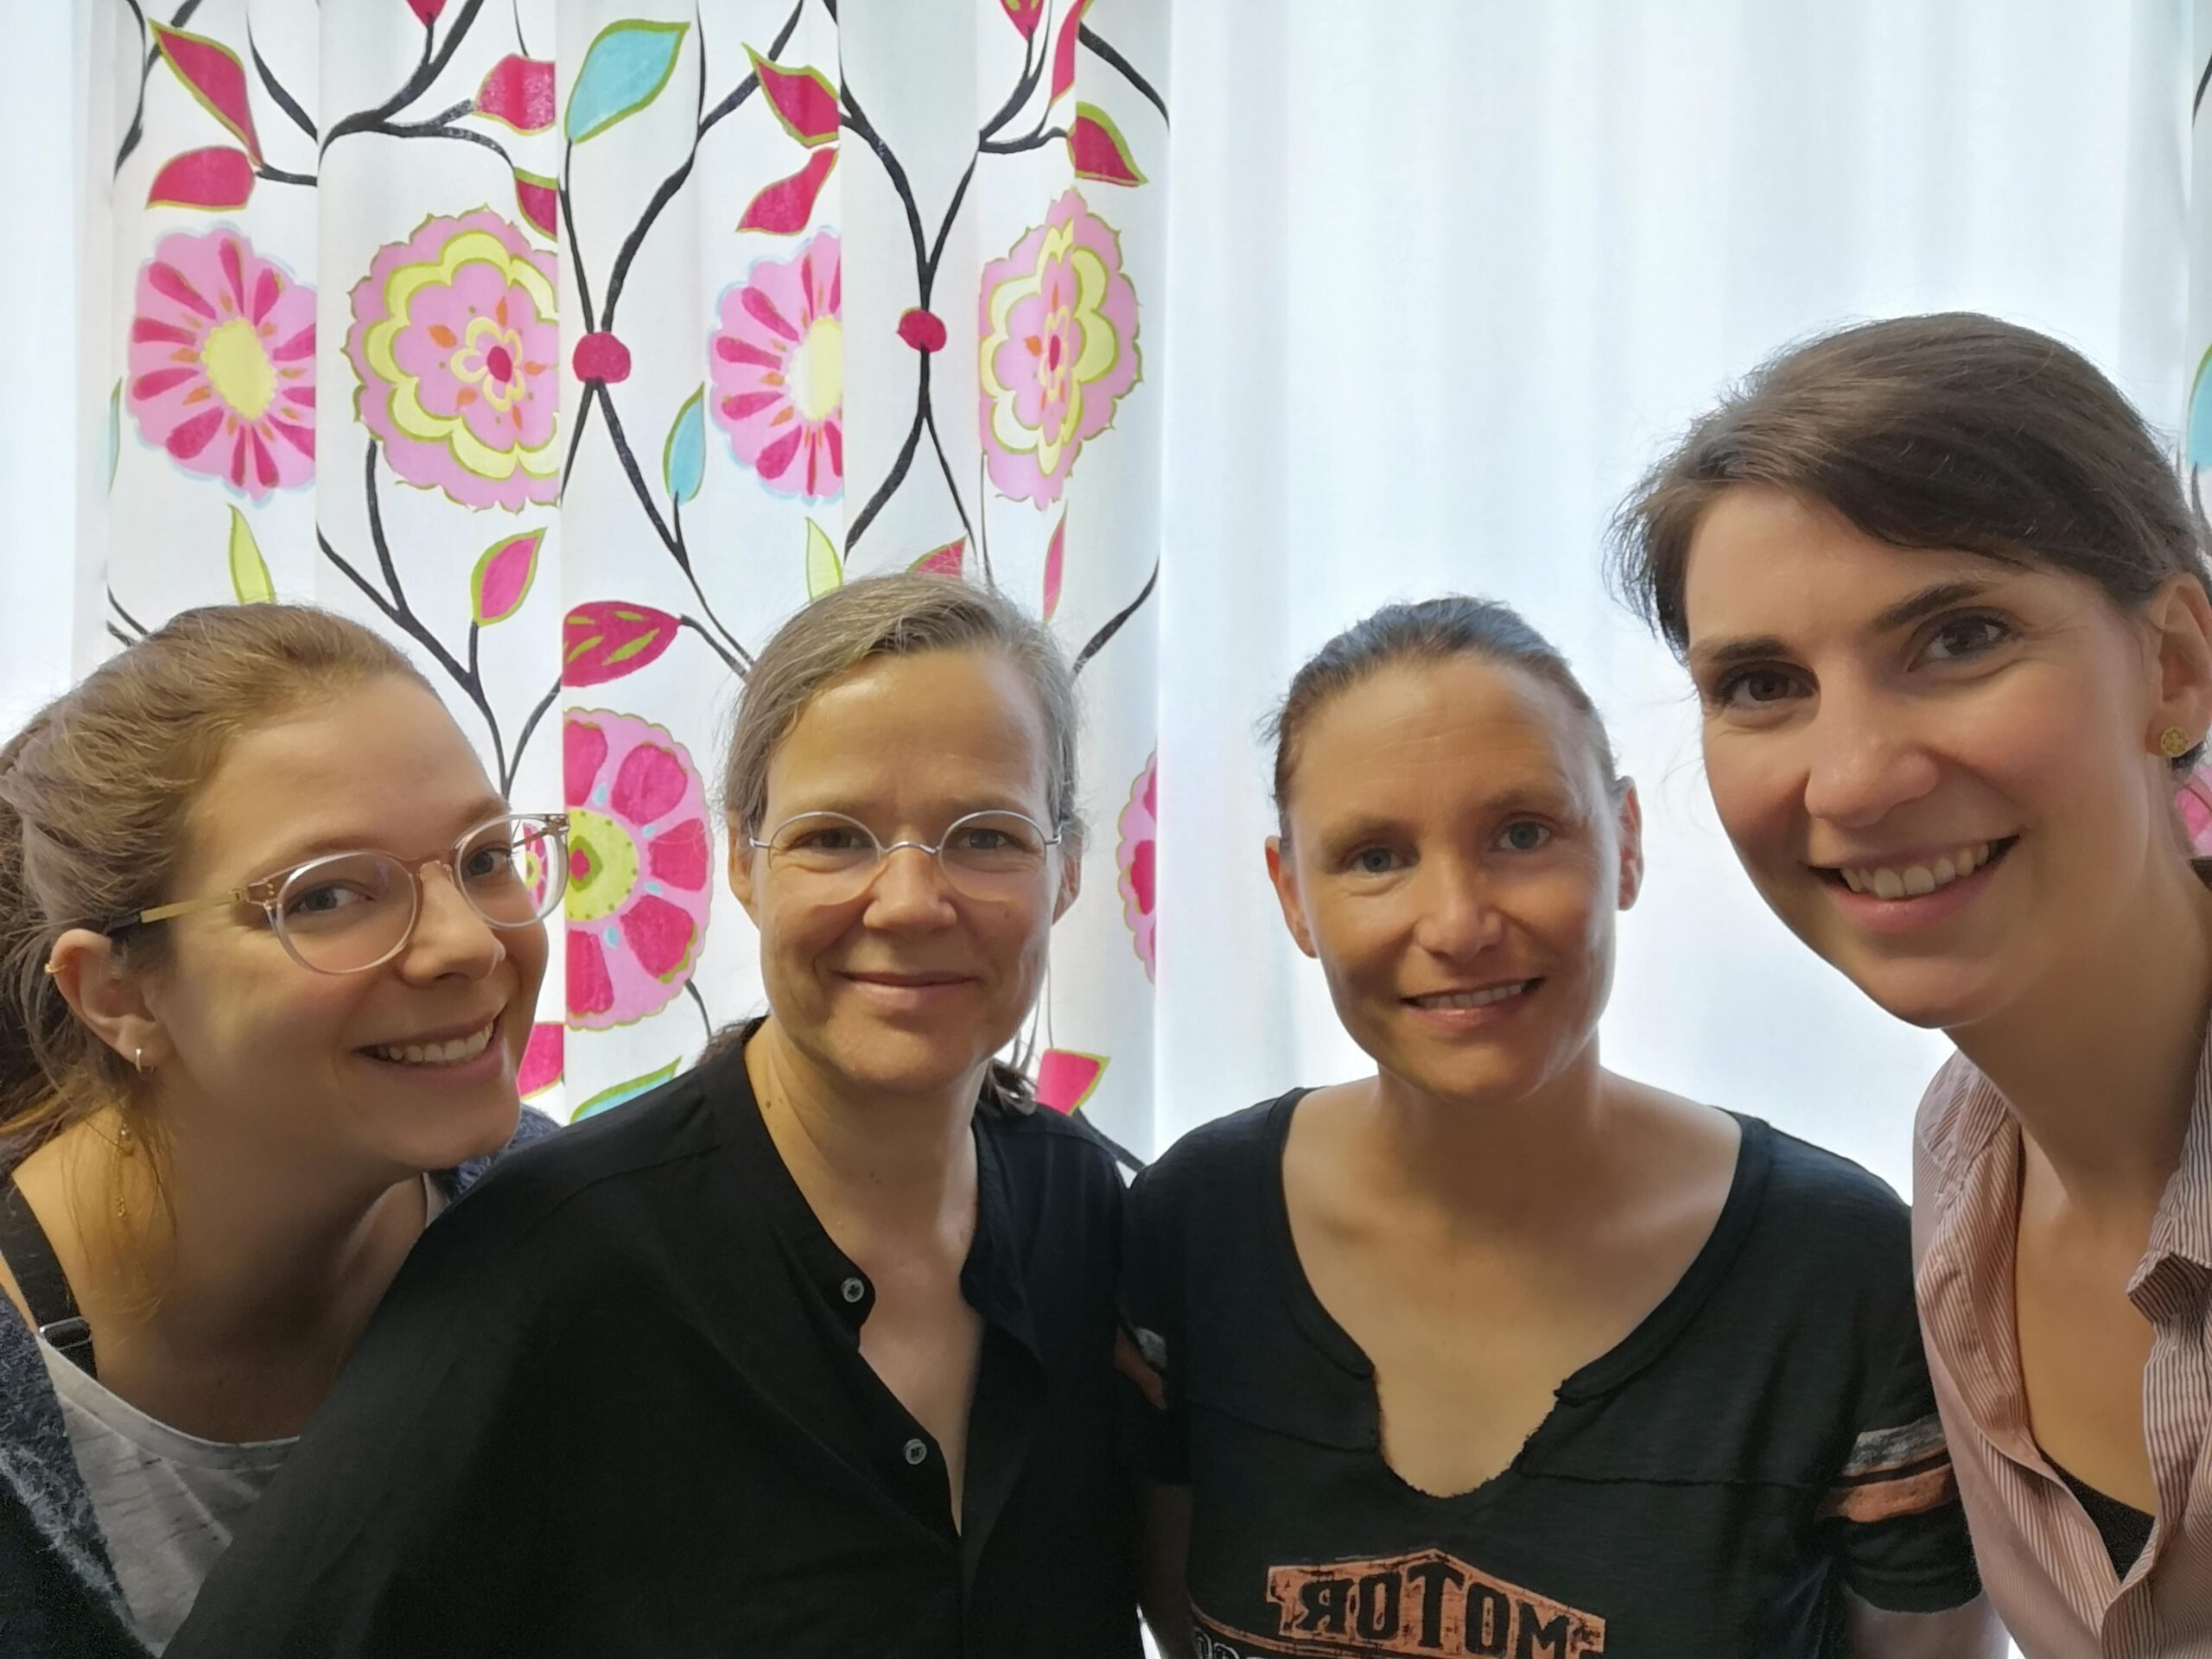 Sprachtherapeutische Praxis Anke Lehmann